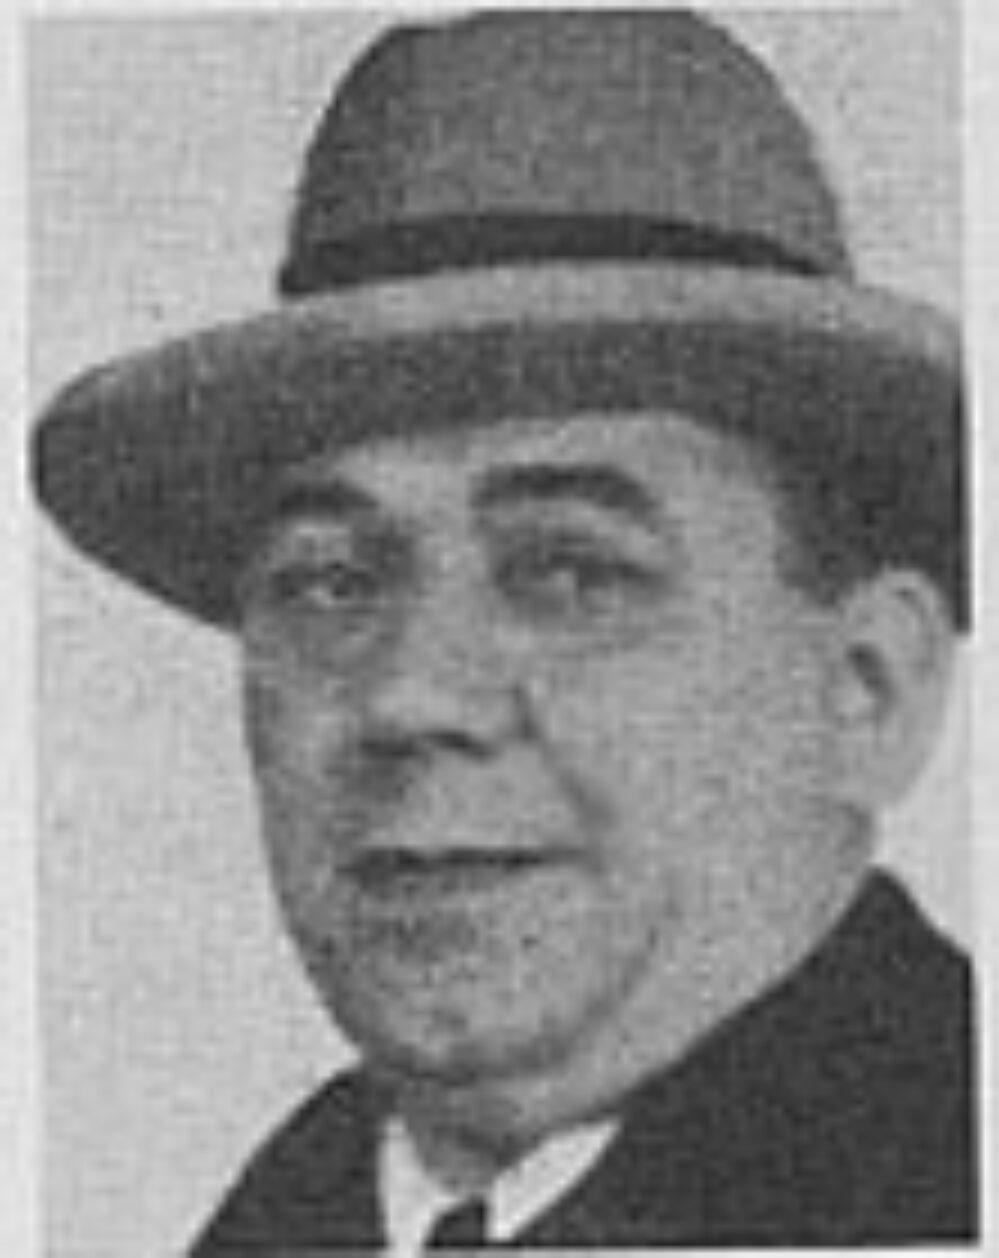 Johannes Juel Larsen